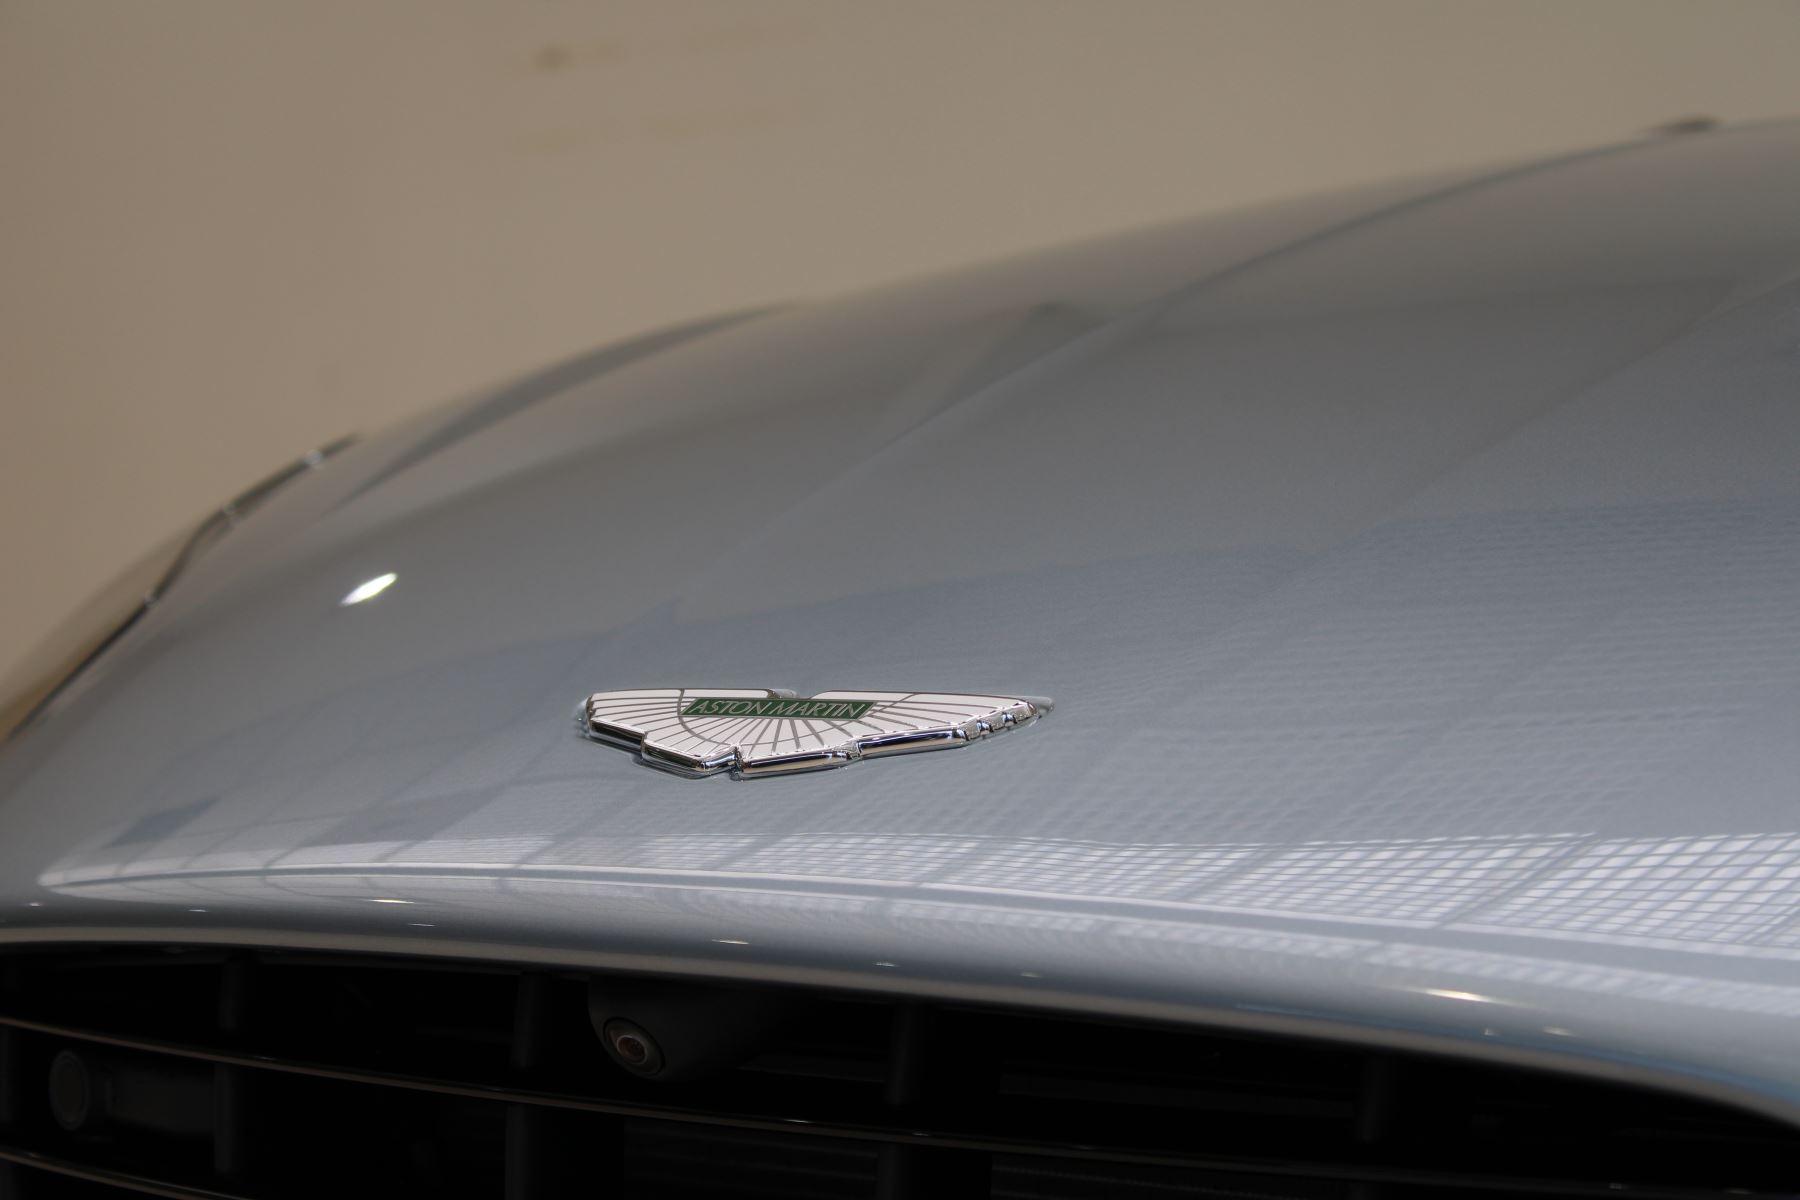 Aston Martin DB11 V8 2dr Touchtronic Auto image 8